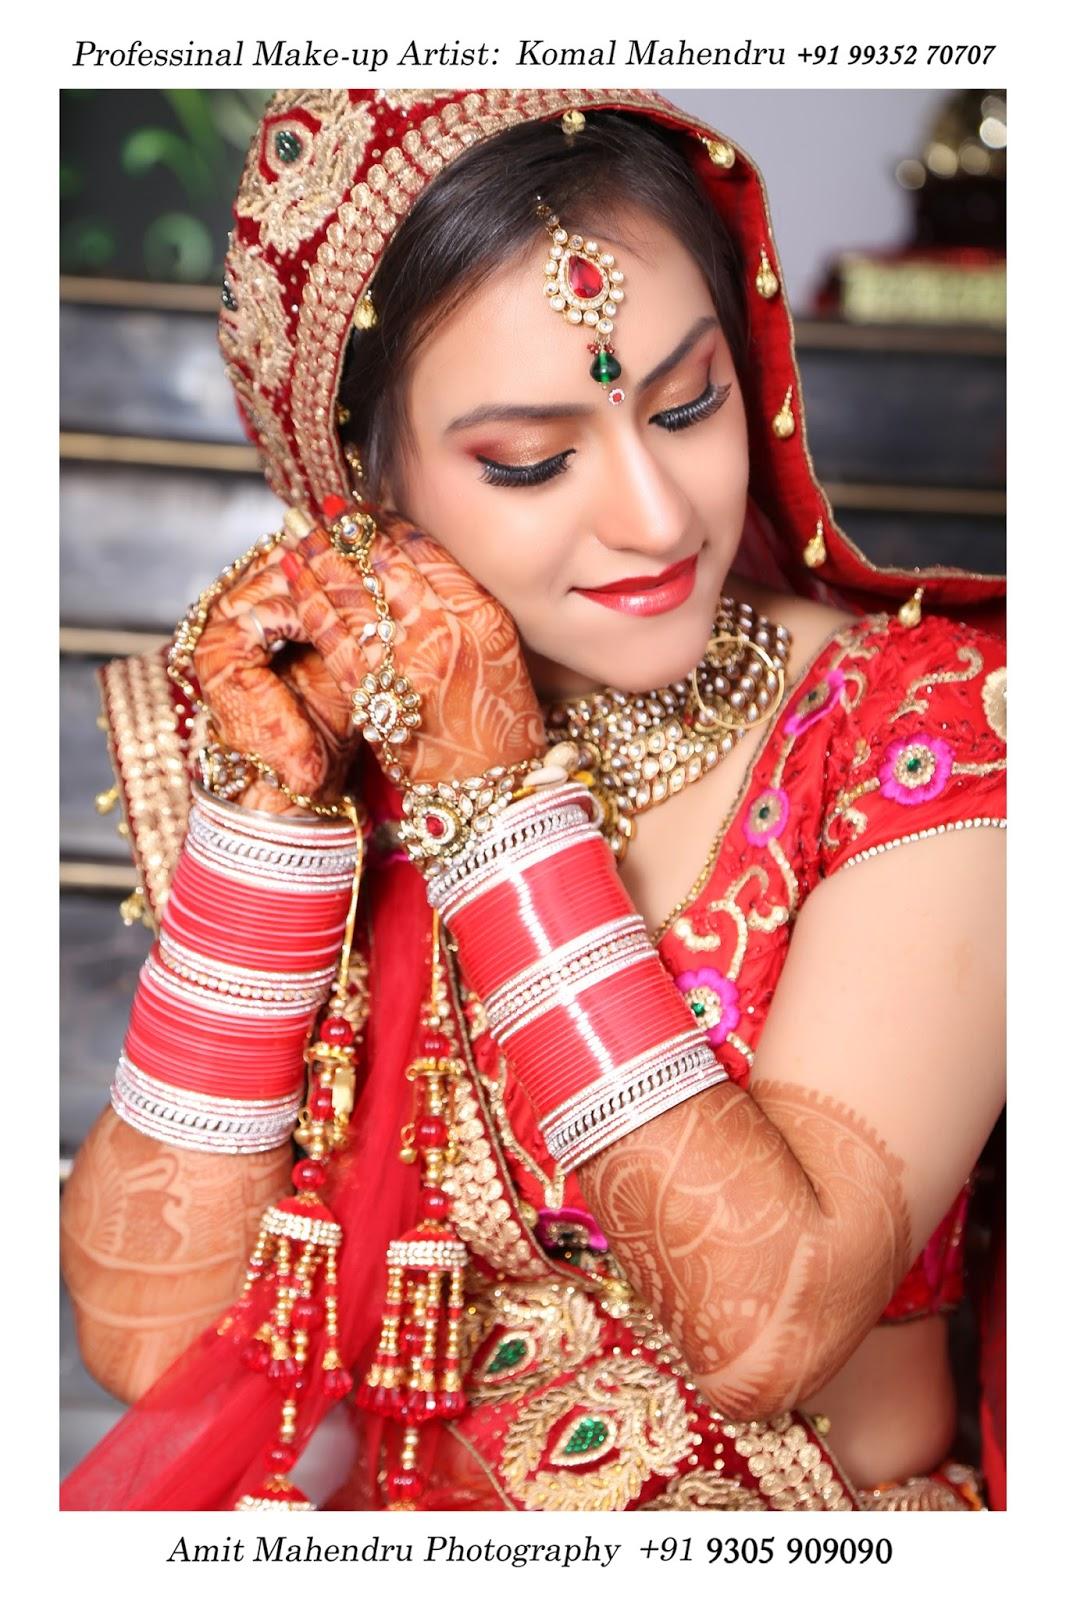 Komal mahendru s professional makeup lucknow india bridal makeup -  Komal Mahendru S Professional Makeup Lucknow India Beauty